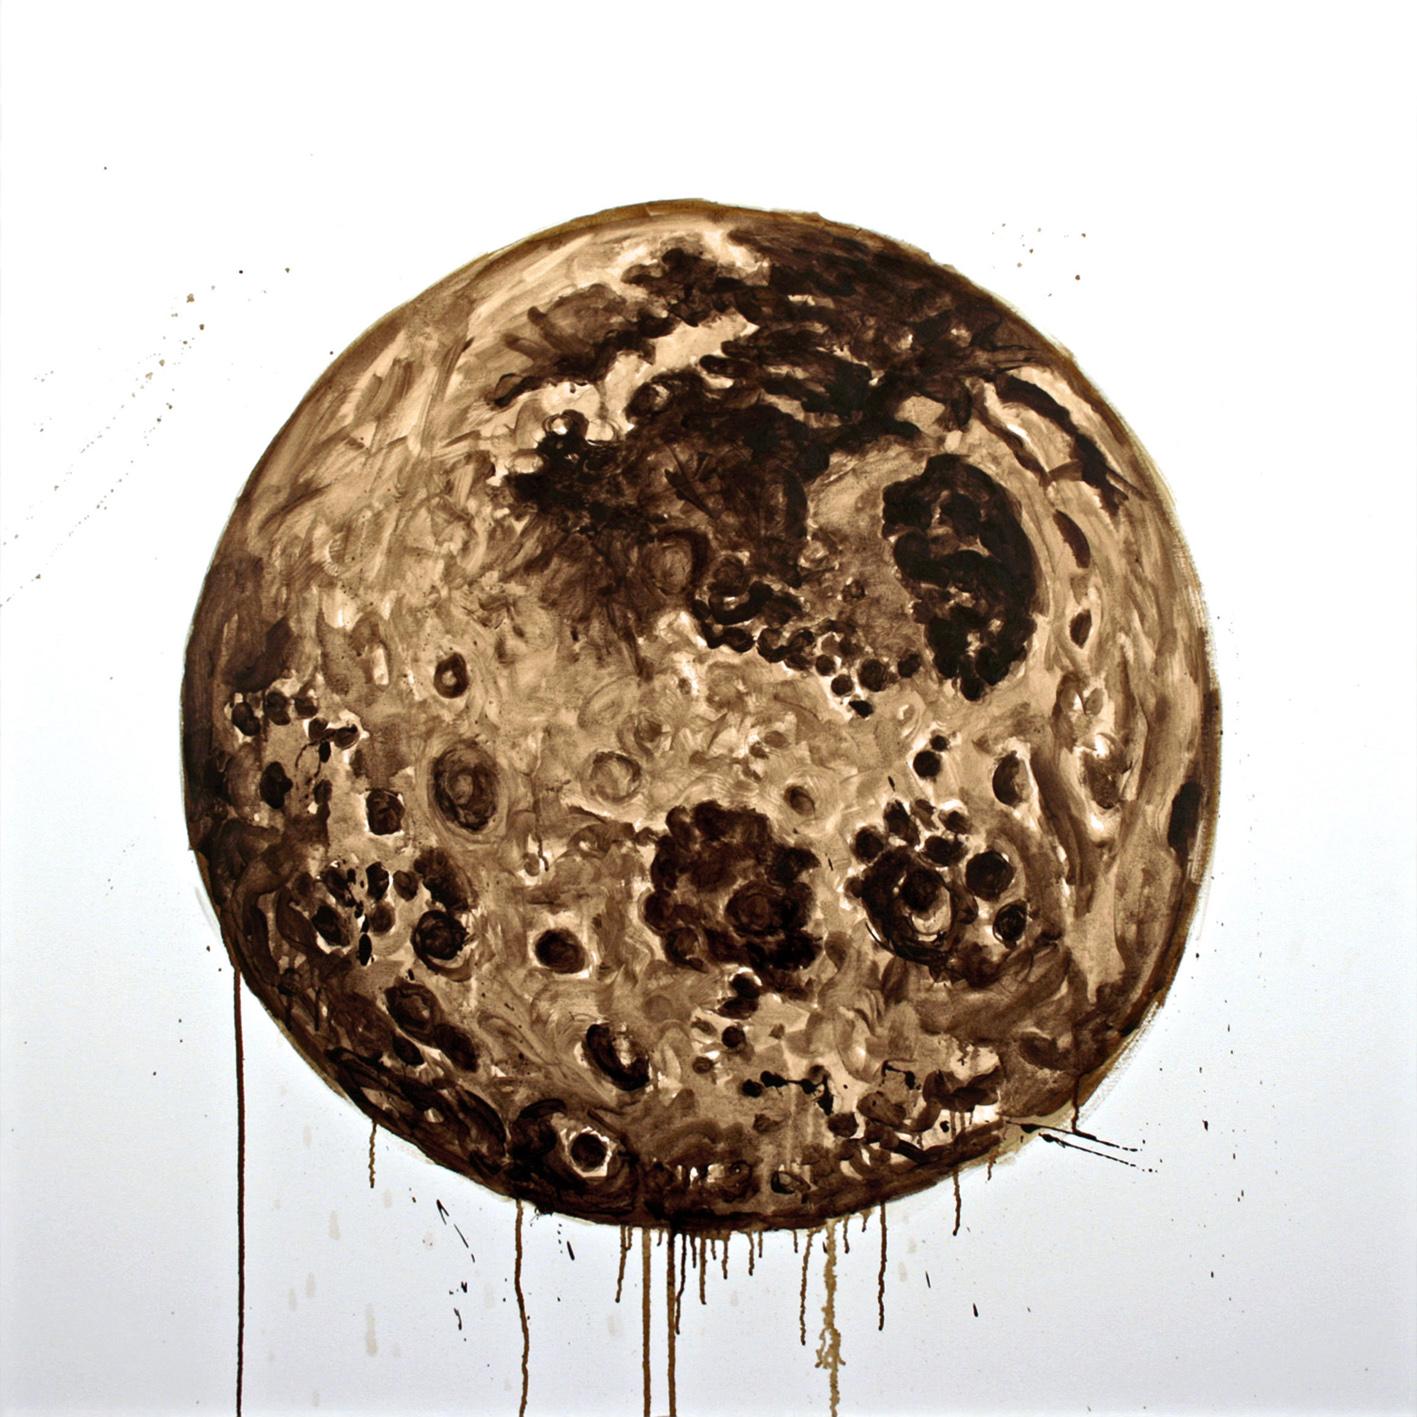 Monochrome Moon